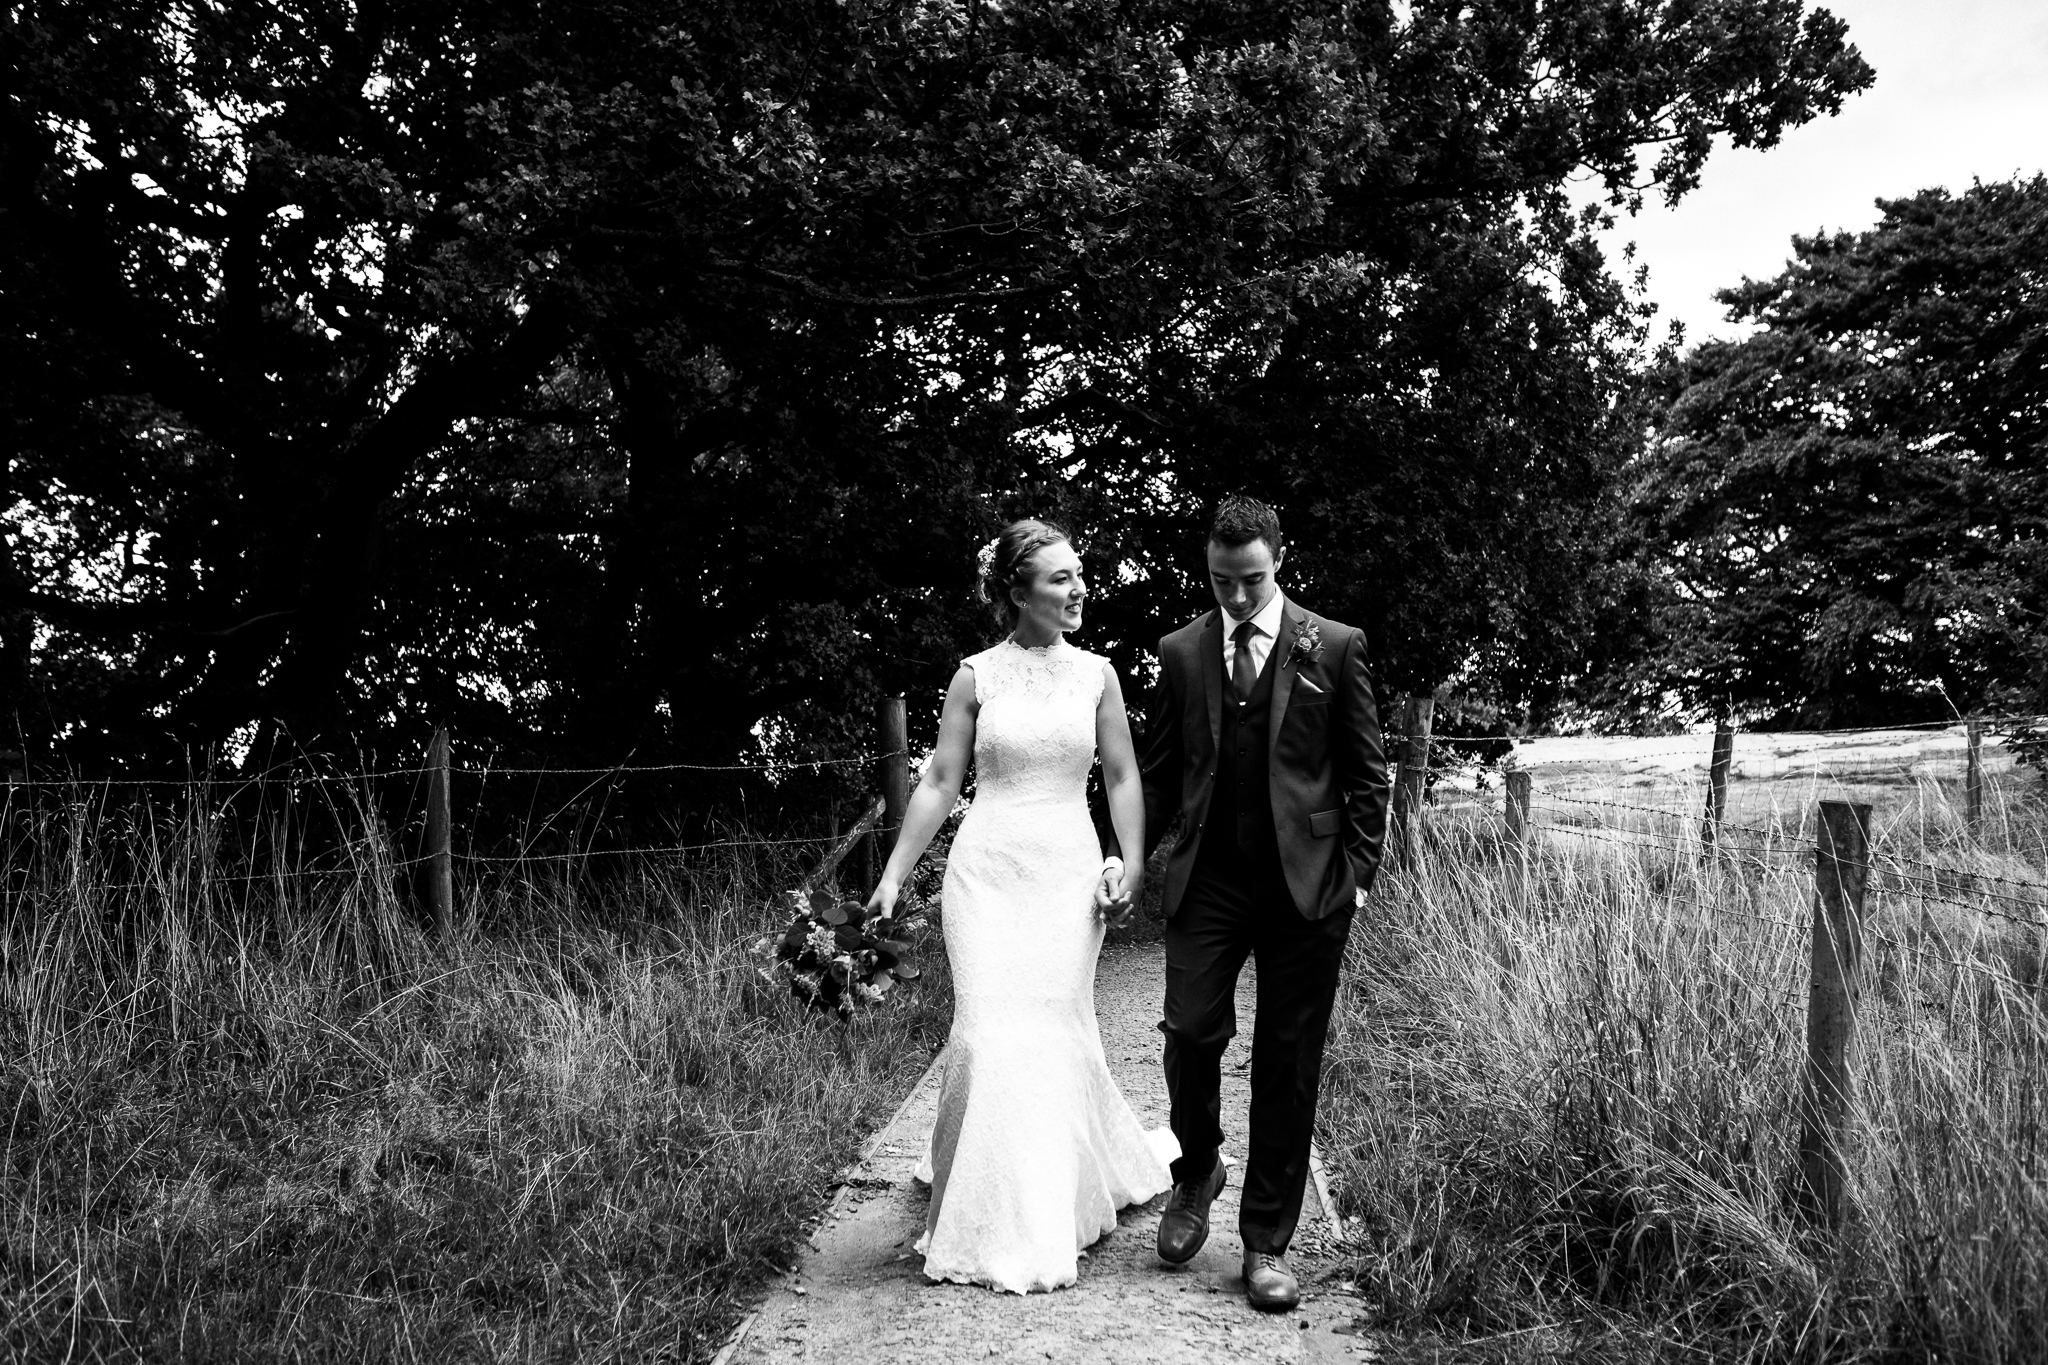 Relaxed Documentary Wedding Photography at The Wizard Inn, Alderley Edge Cheshire - Jenny Harper-47.jpg